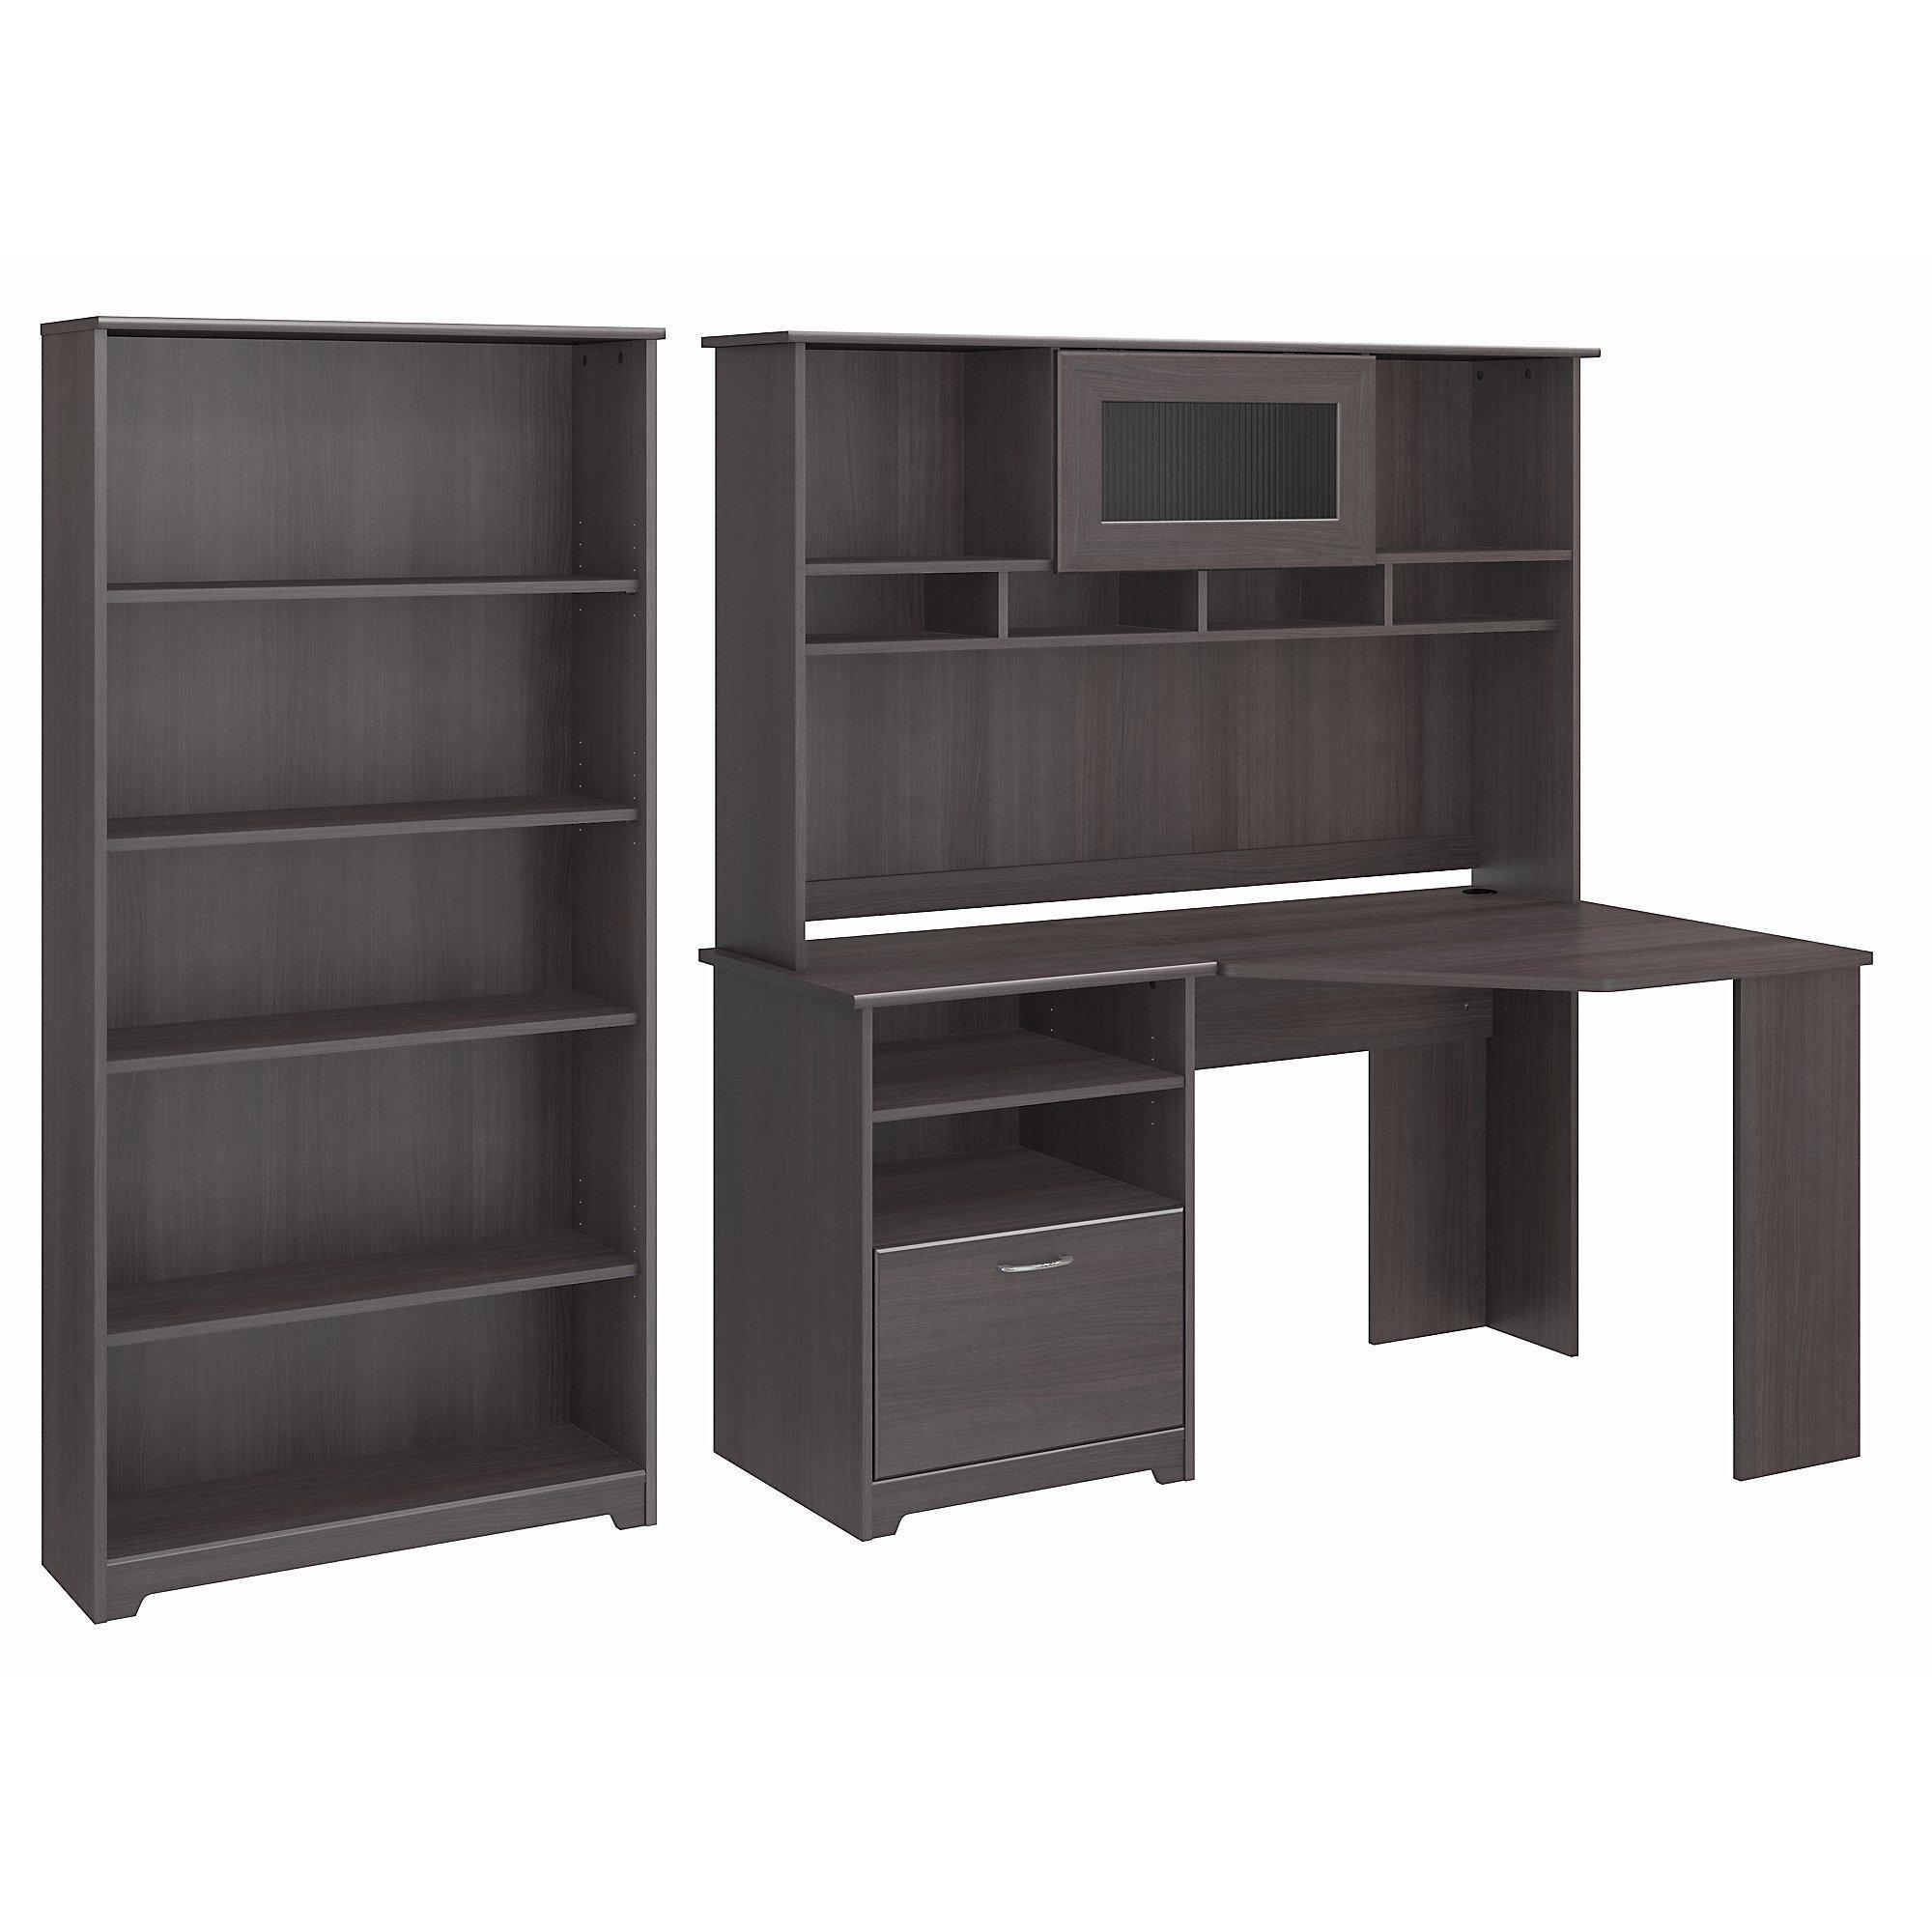 Bush Furniture Cabot Corner Desk with Hutch and 5 Shelf Bookcase in Heather Gray by Bush Furniture